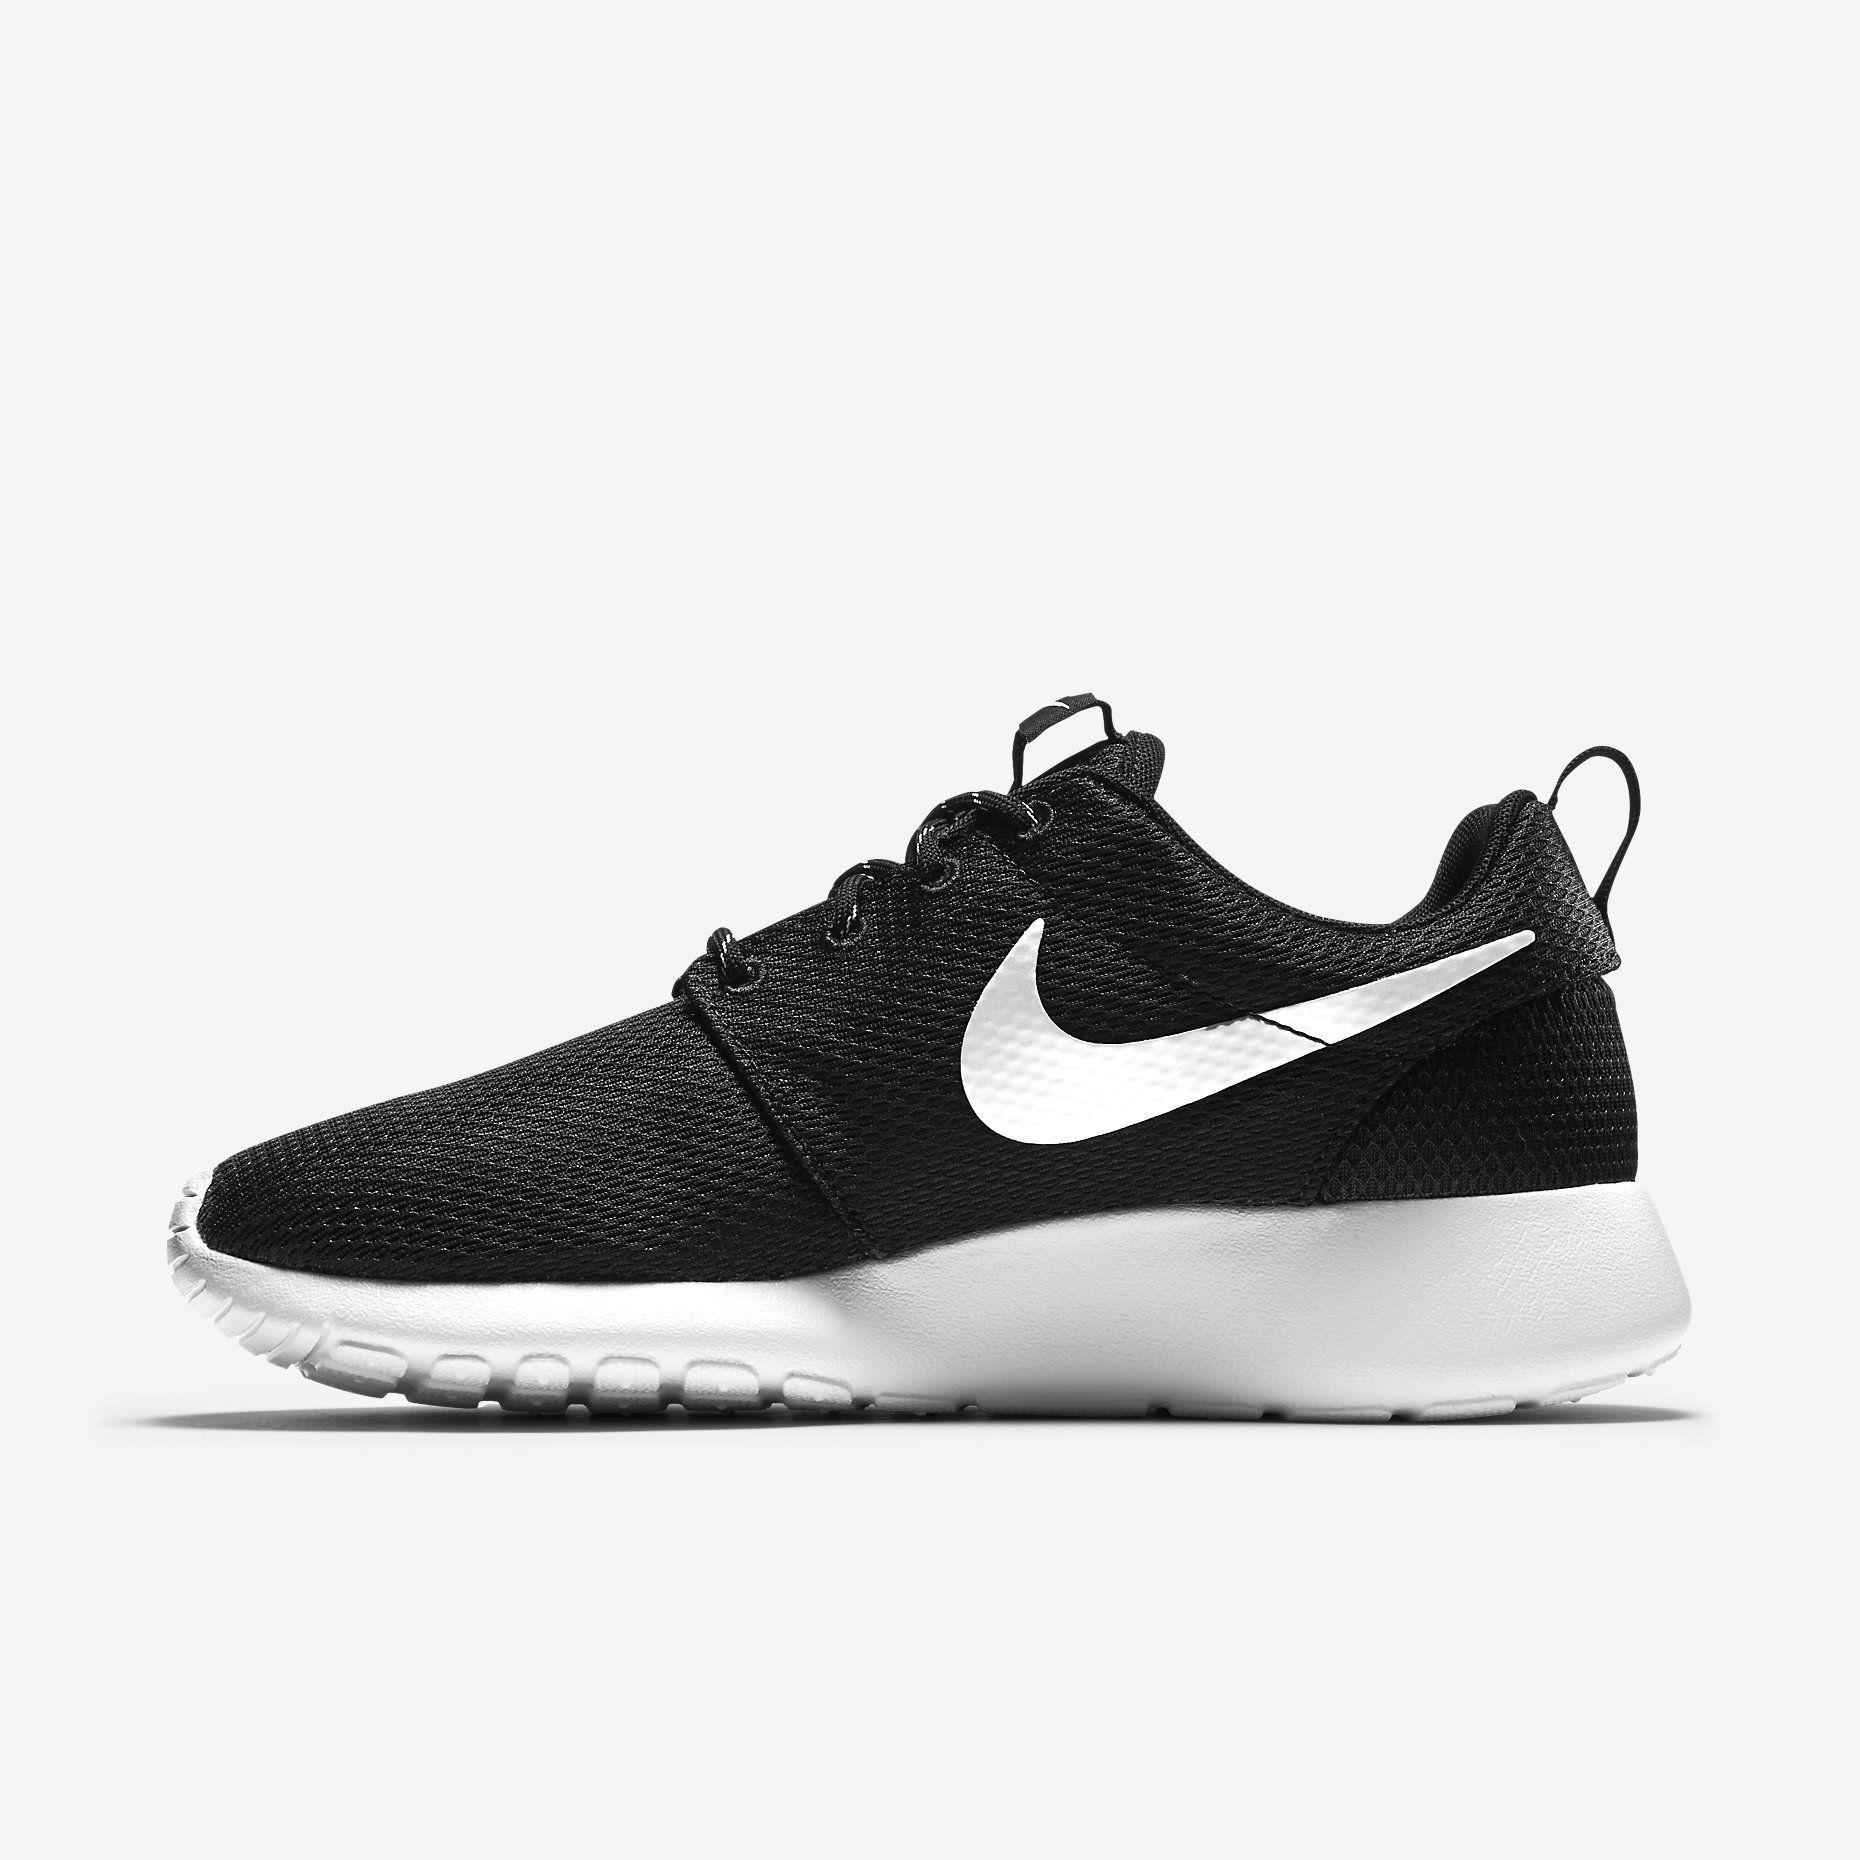 Existencia académico impacto  Nike Roshe Run Zapatillas - Mujer. Nike Store ES | Zapatillas mujer, Comprar  zapatillas, Nike